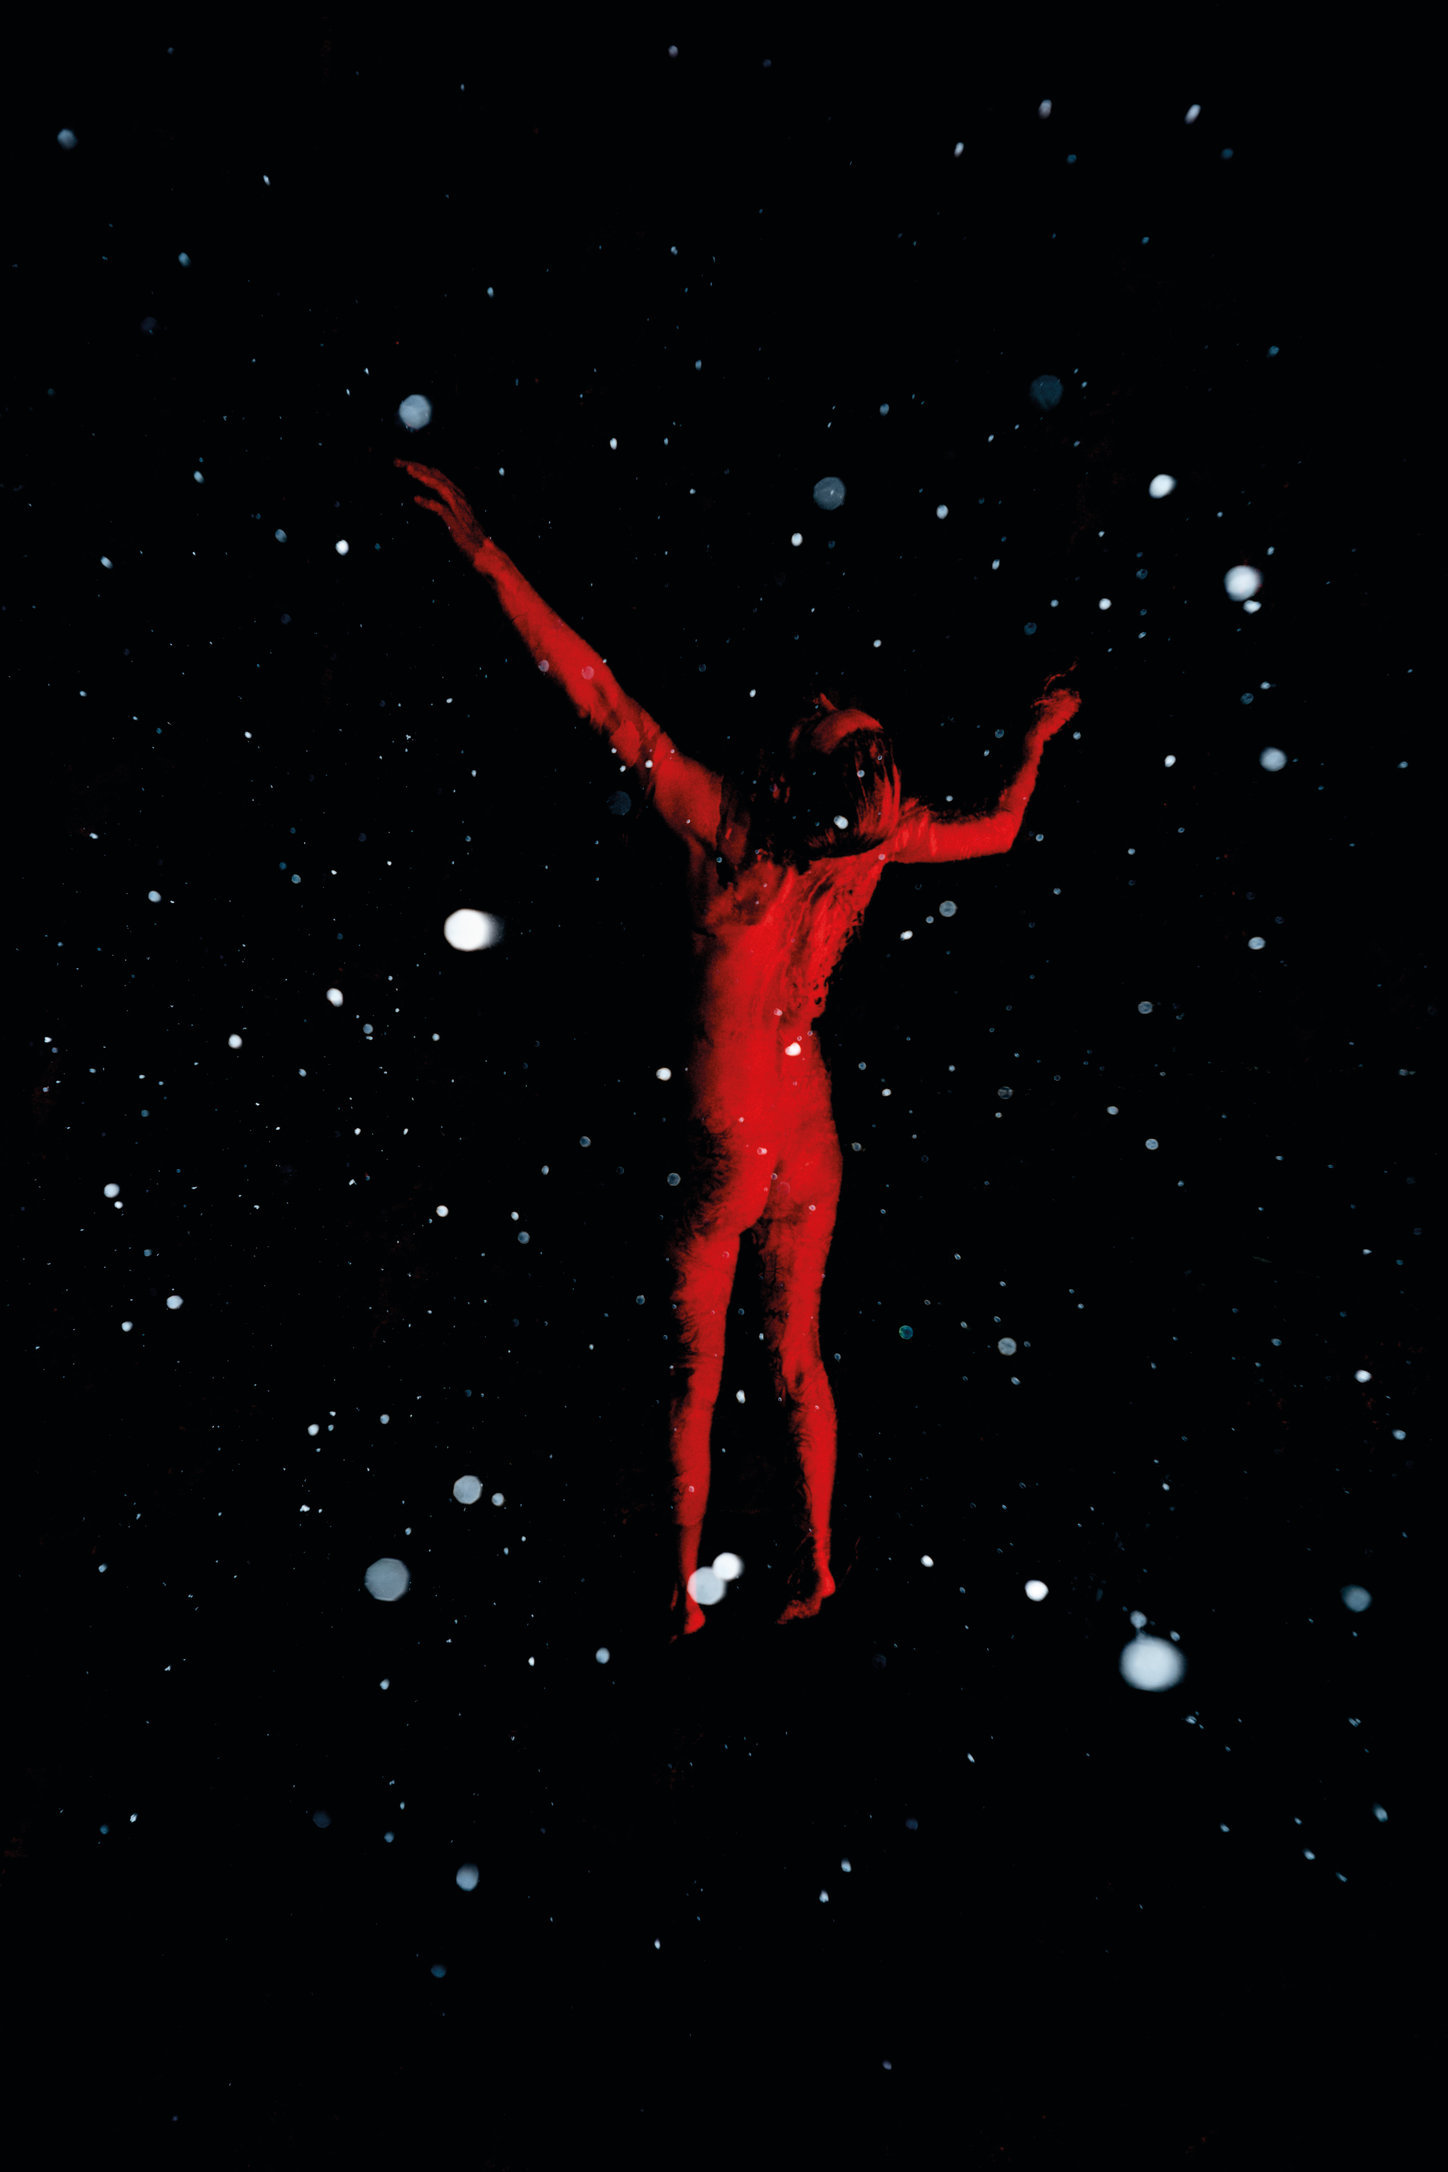 Paul-Cupido-Teardrop-CMYK.tif